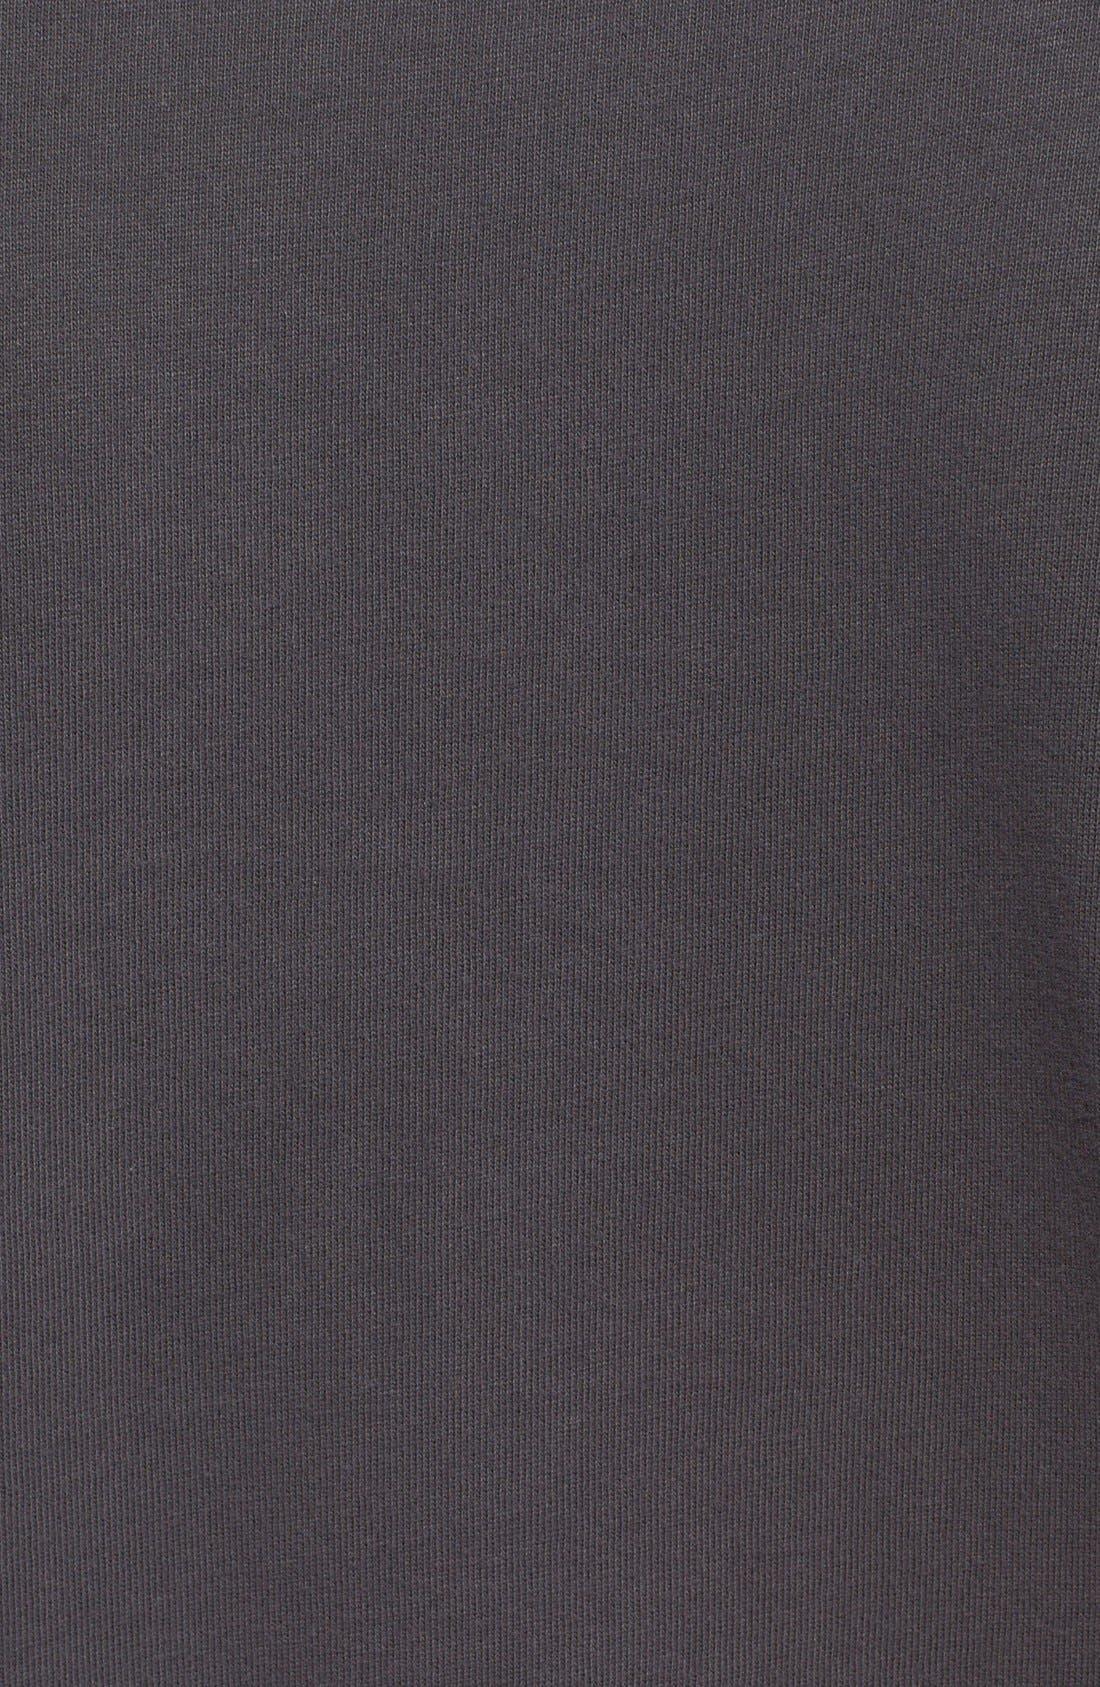 Levi's Vintage Clothing '1950s' Pocket T-Shirt,                             Alternate thumbnail 5, color,                             001